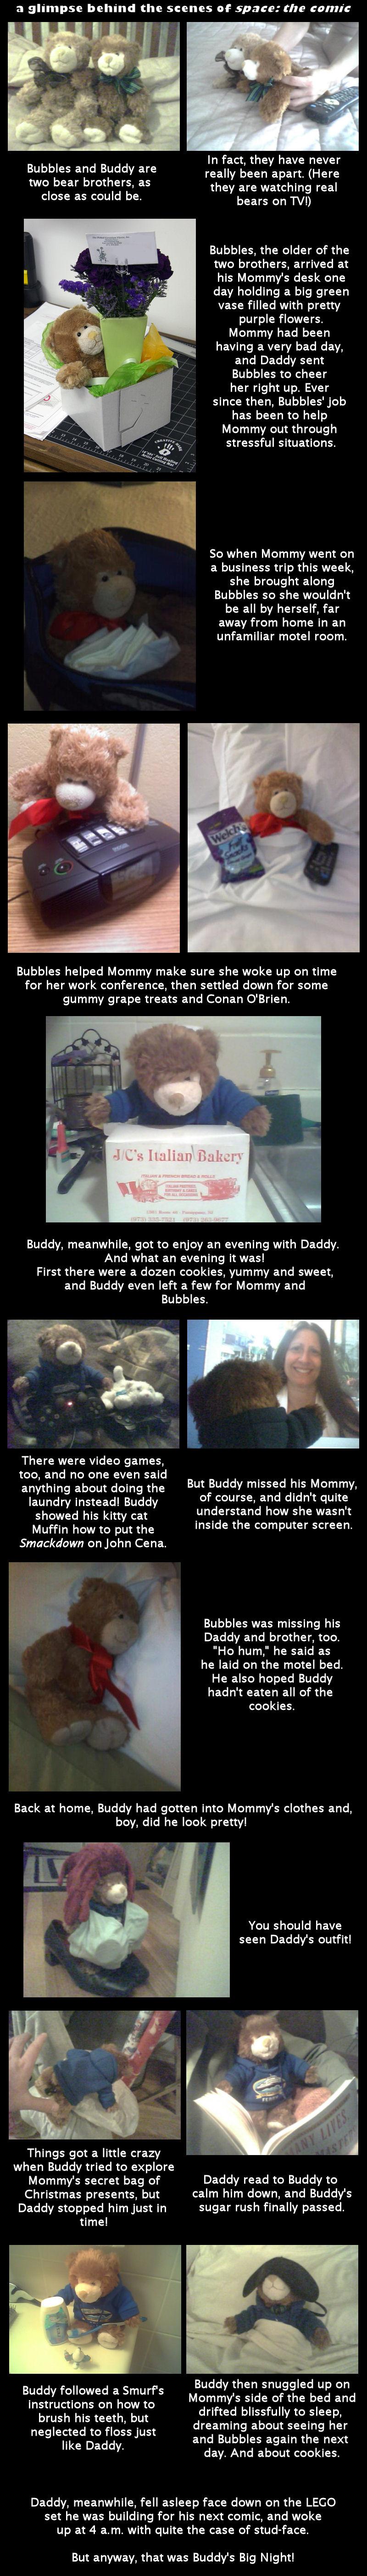 Buddy's Big Night